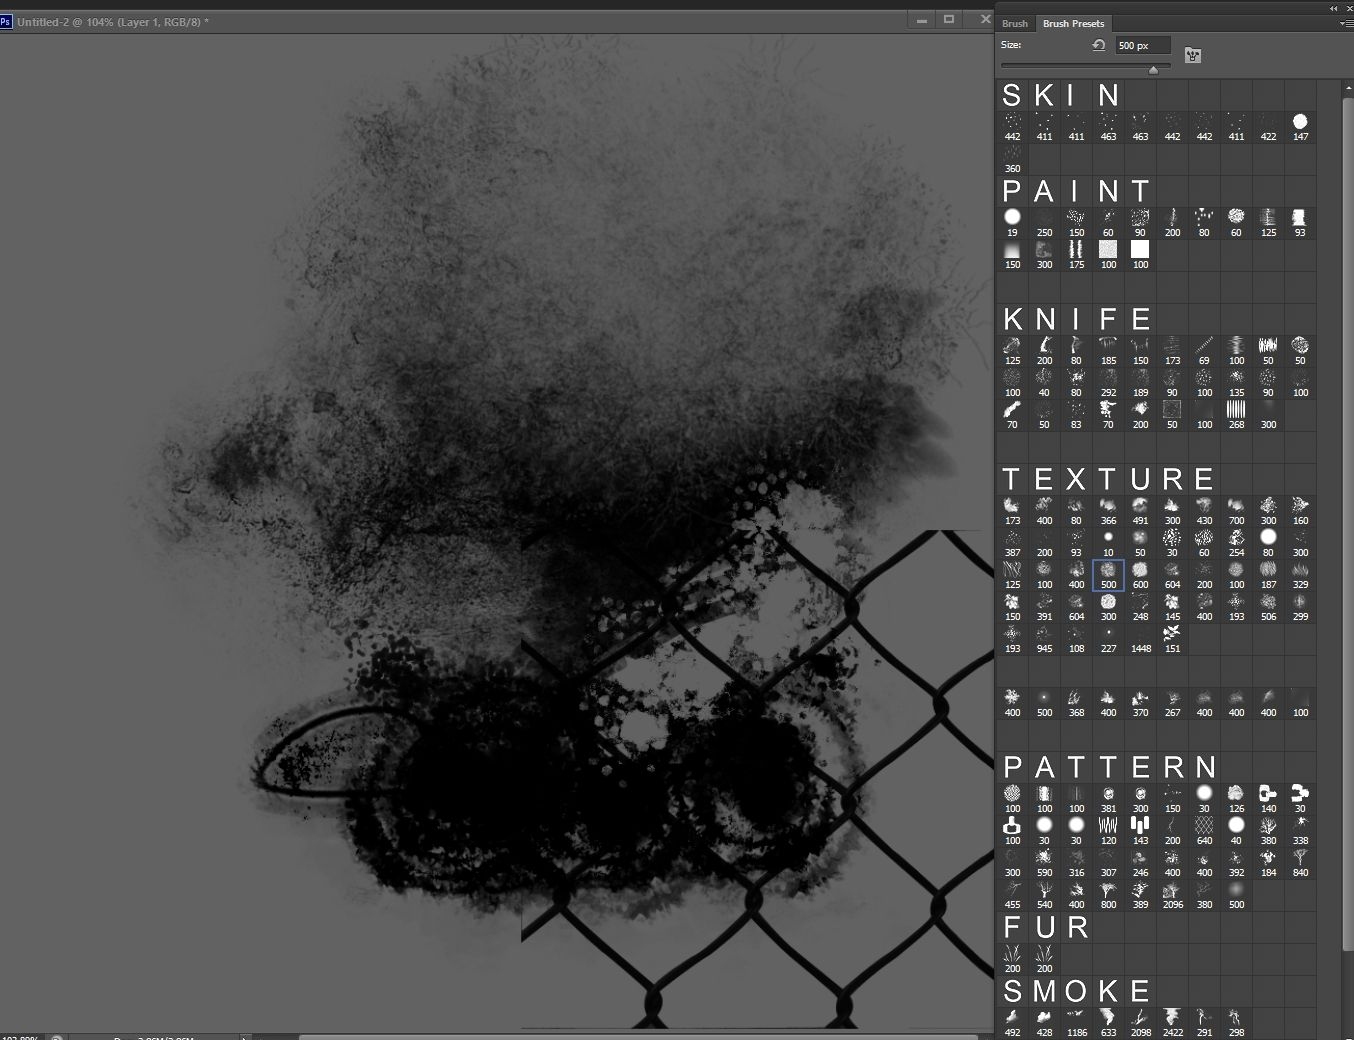 Photoshop Brush Preset arranging! - Polycount Forum | Game Art ...